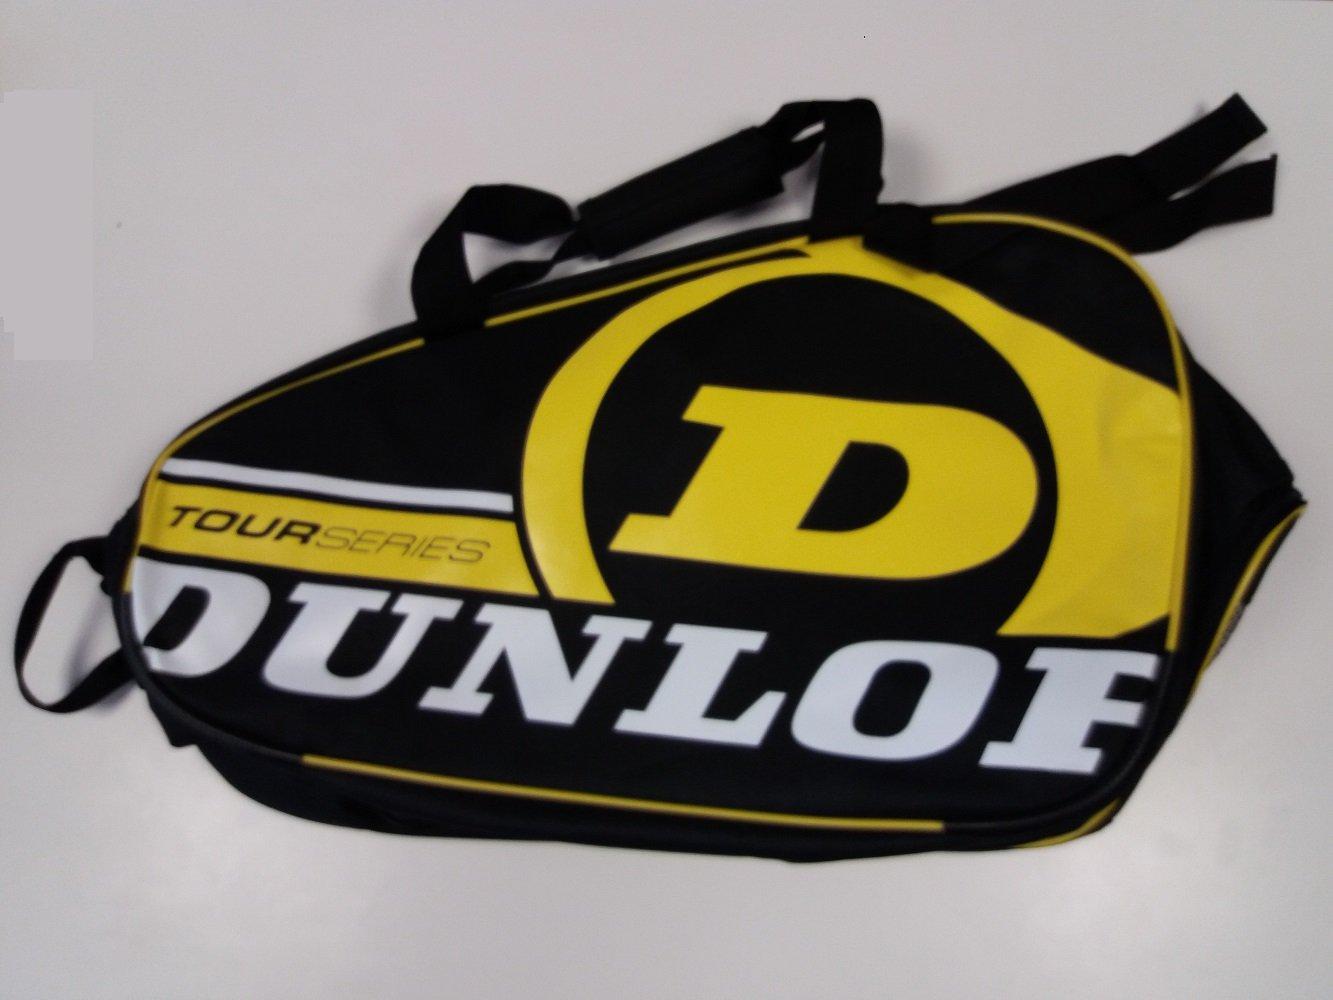 Paletero de pá del Dunlop Tour Intro Negro / Amarillo